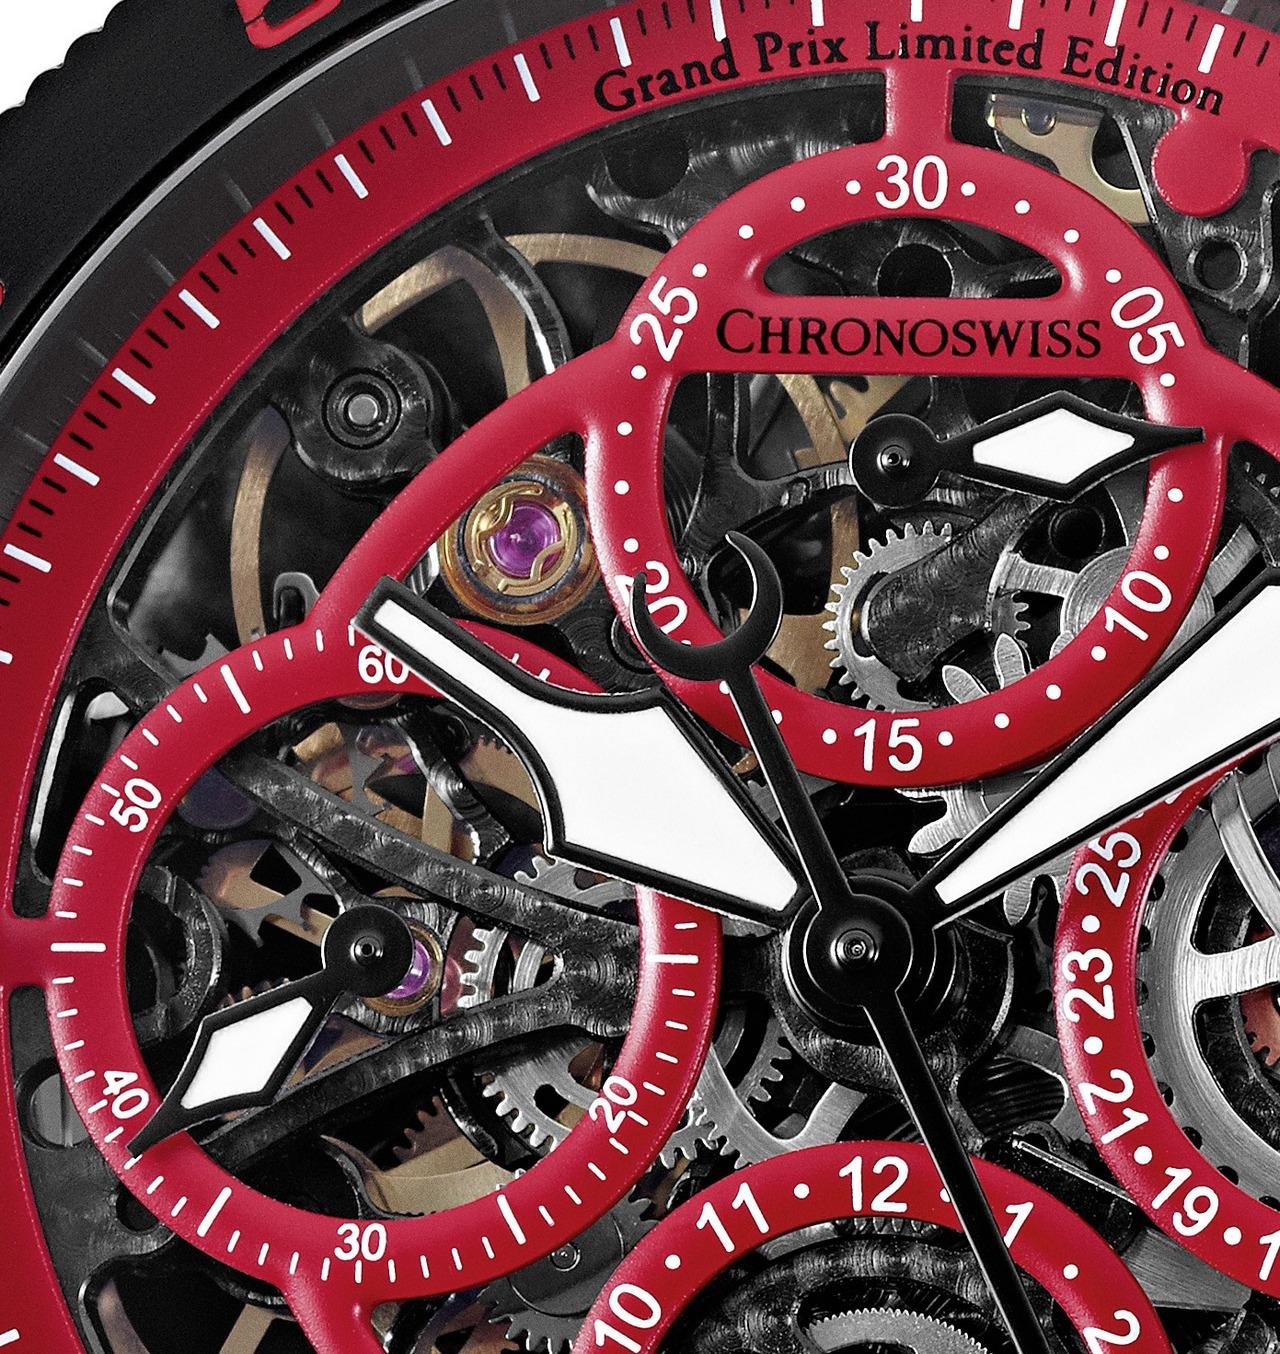 chronoswiss-timemaster-grand-prix-limited-edition_50-100